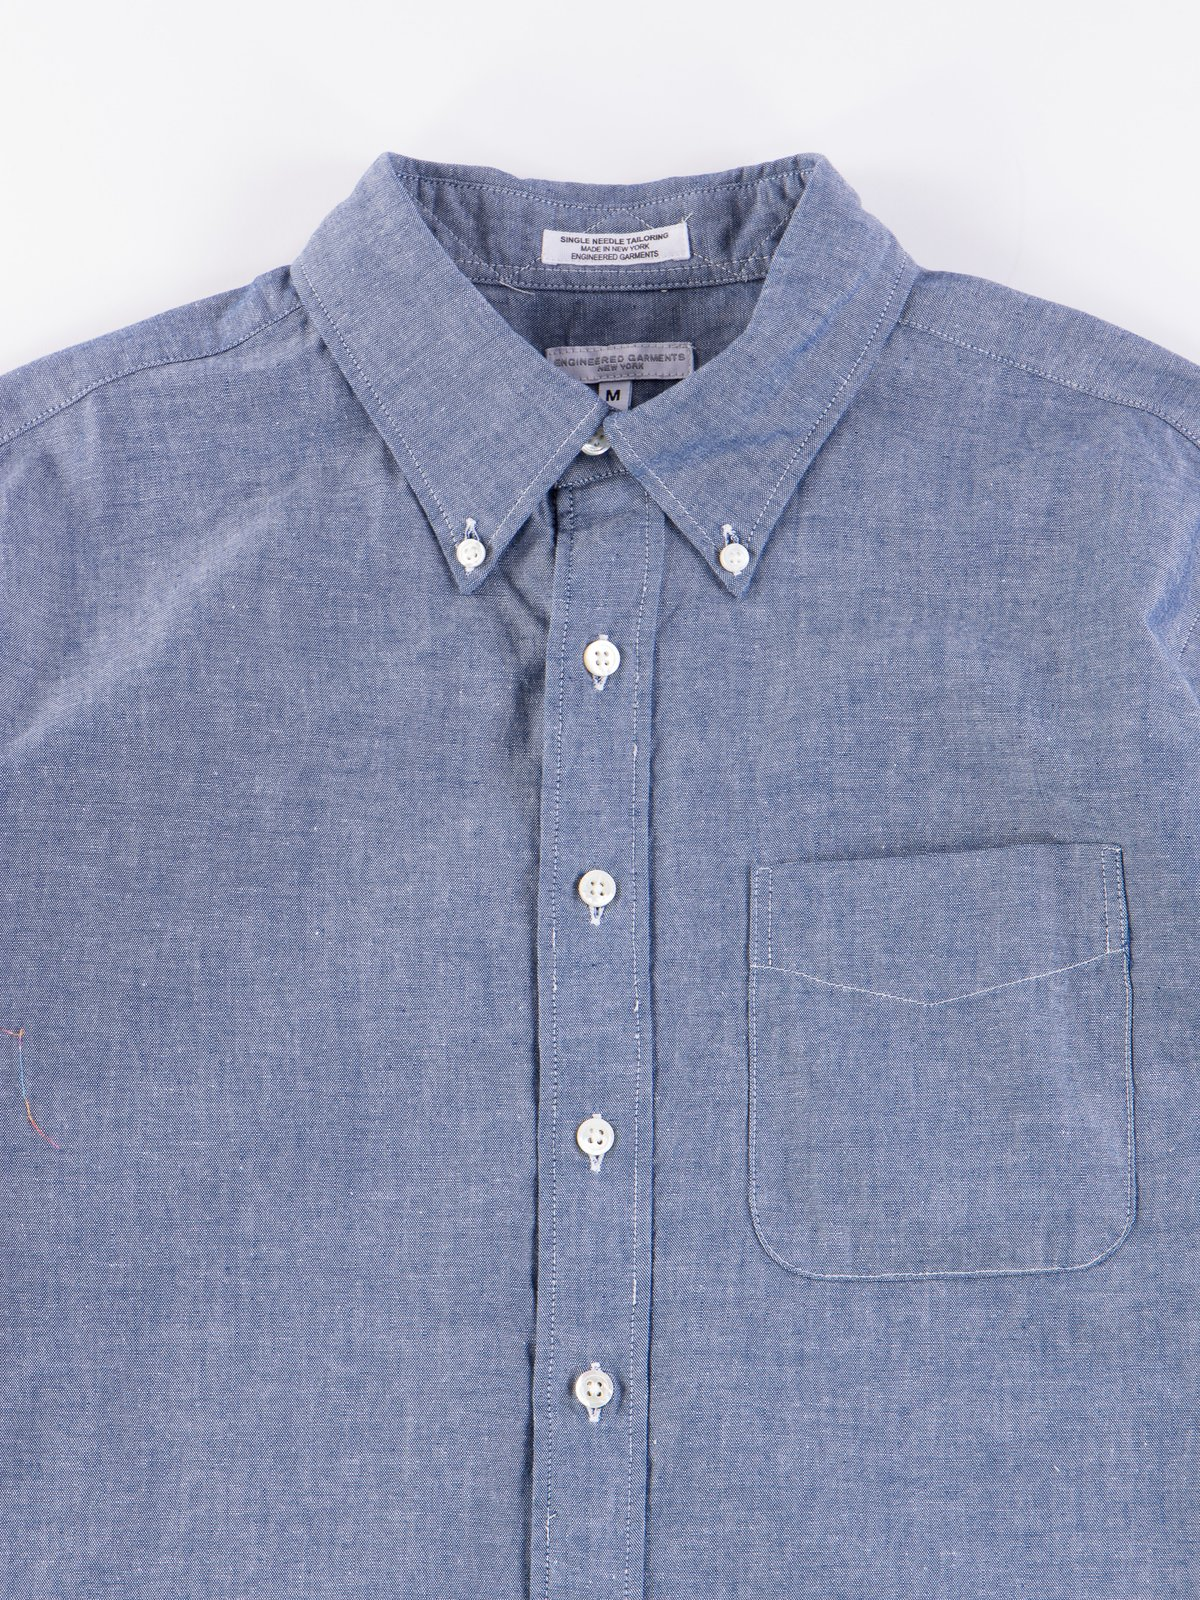 Blue Cotton Chambray 19th Century BD Shirt - Image 4